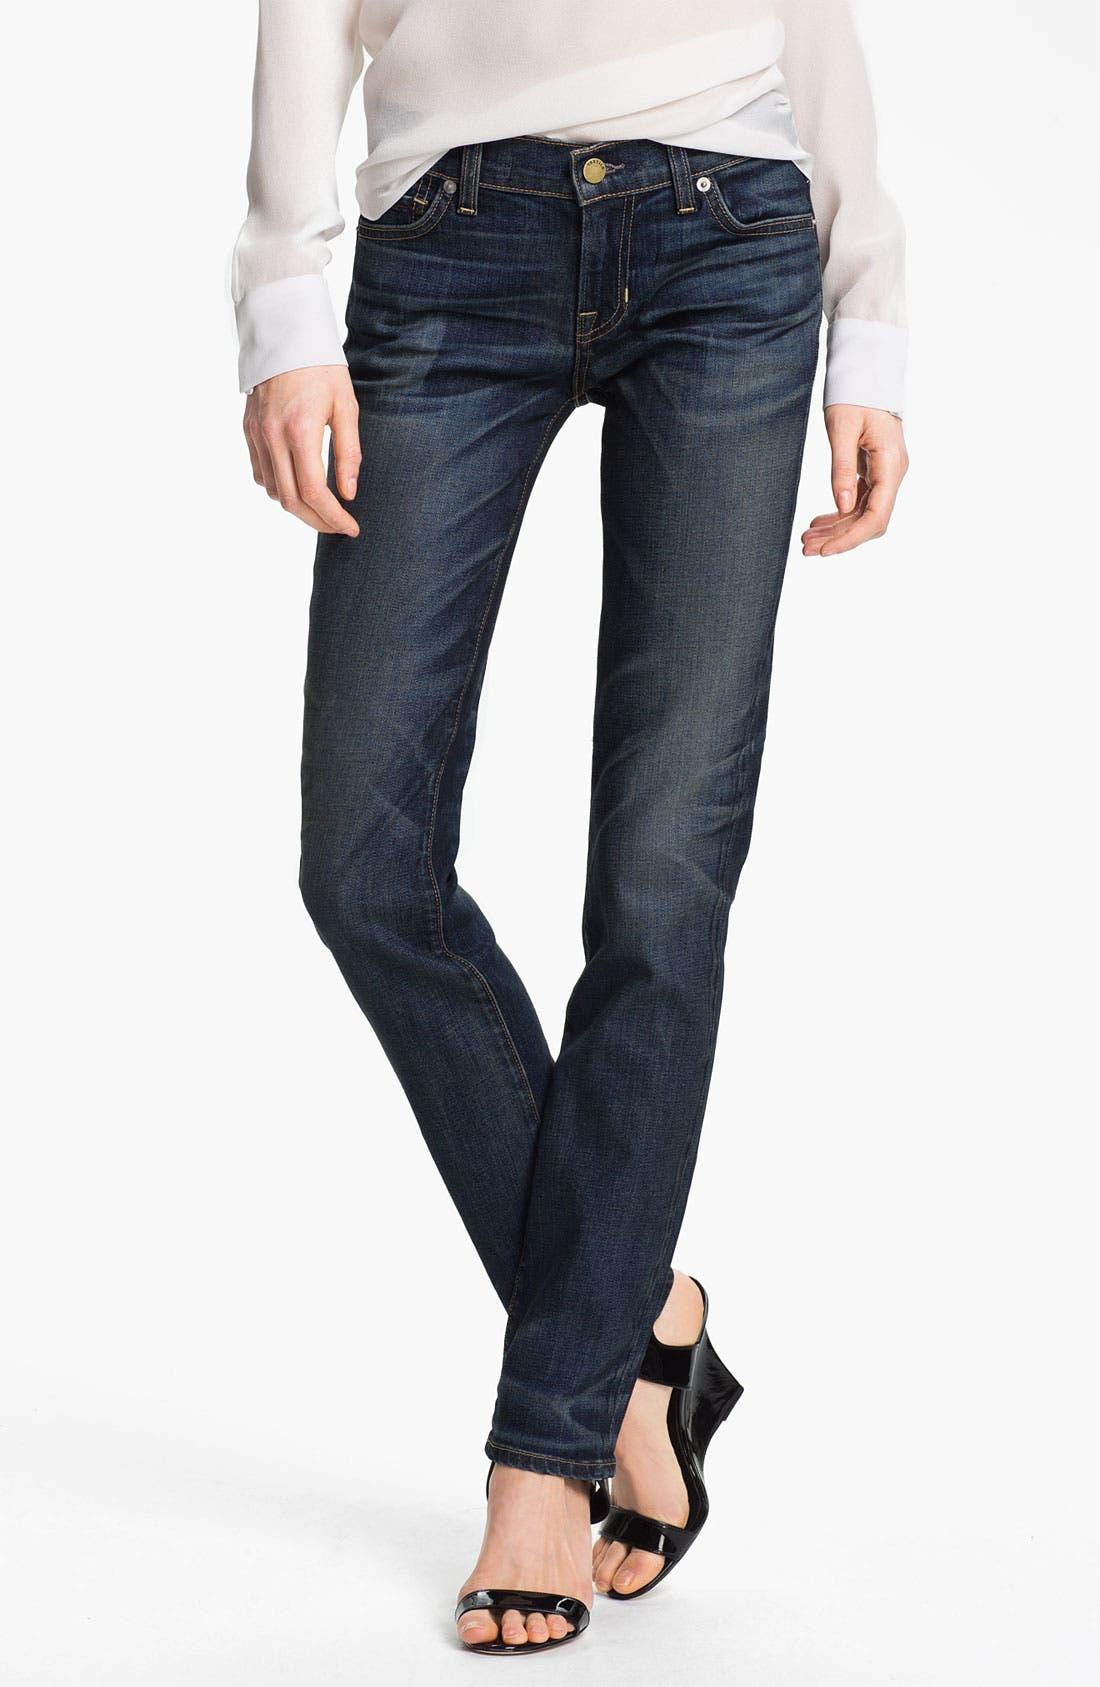 Main Image - TEXTILE Elizabeth and James 'Debbie' Skinny Jeans